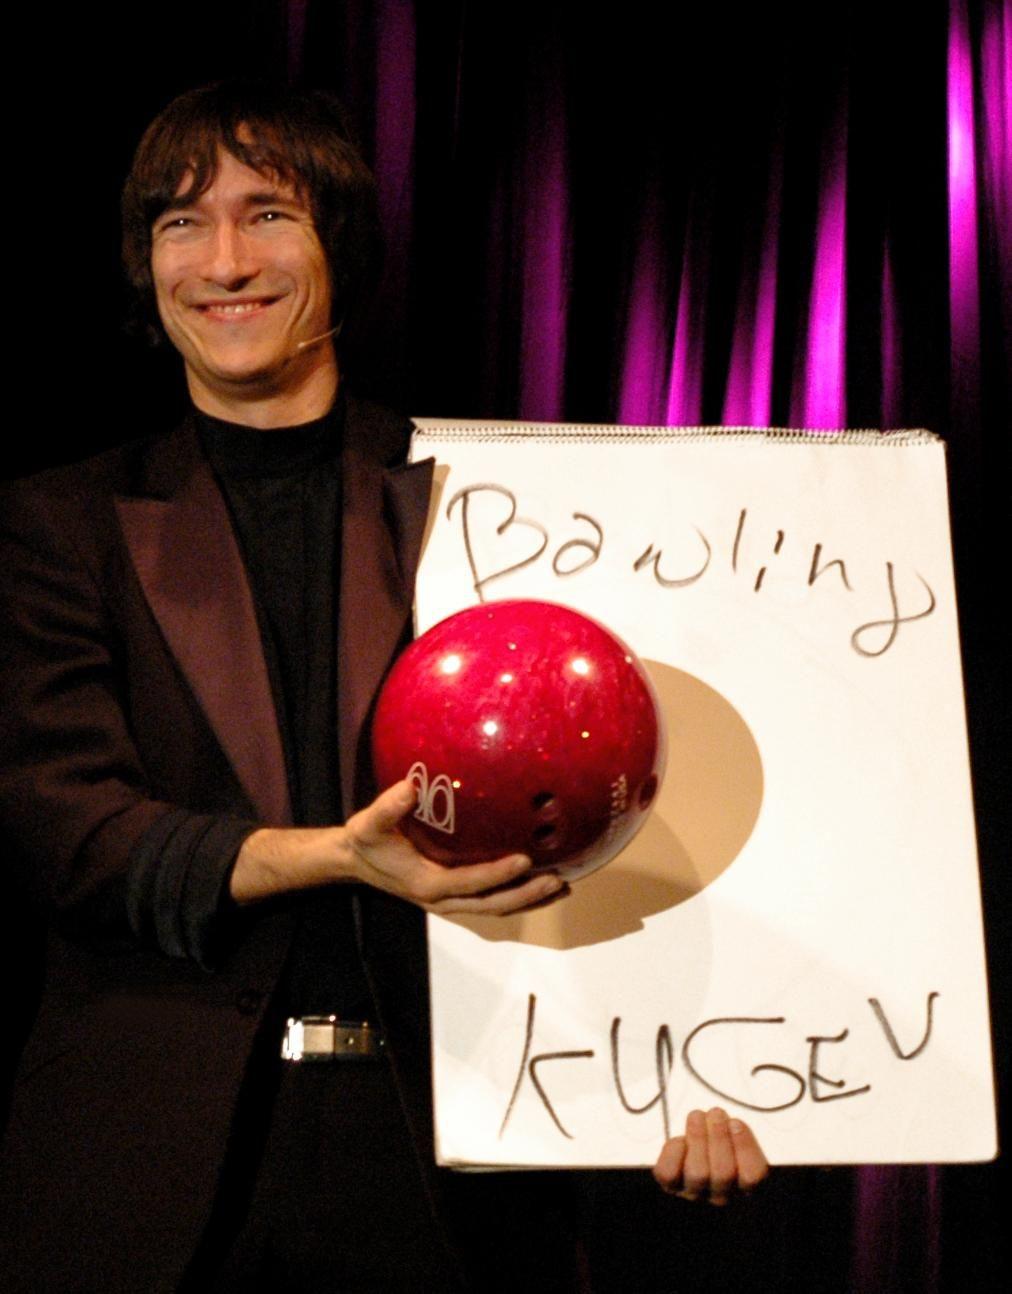 Bowling Kugel